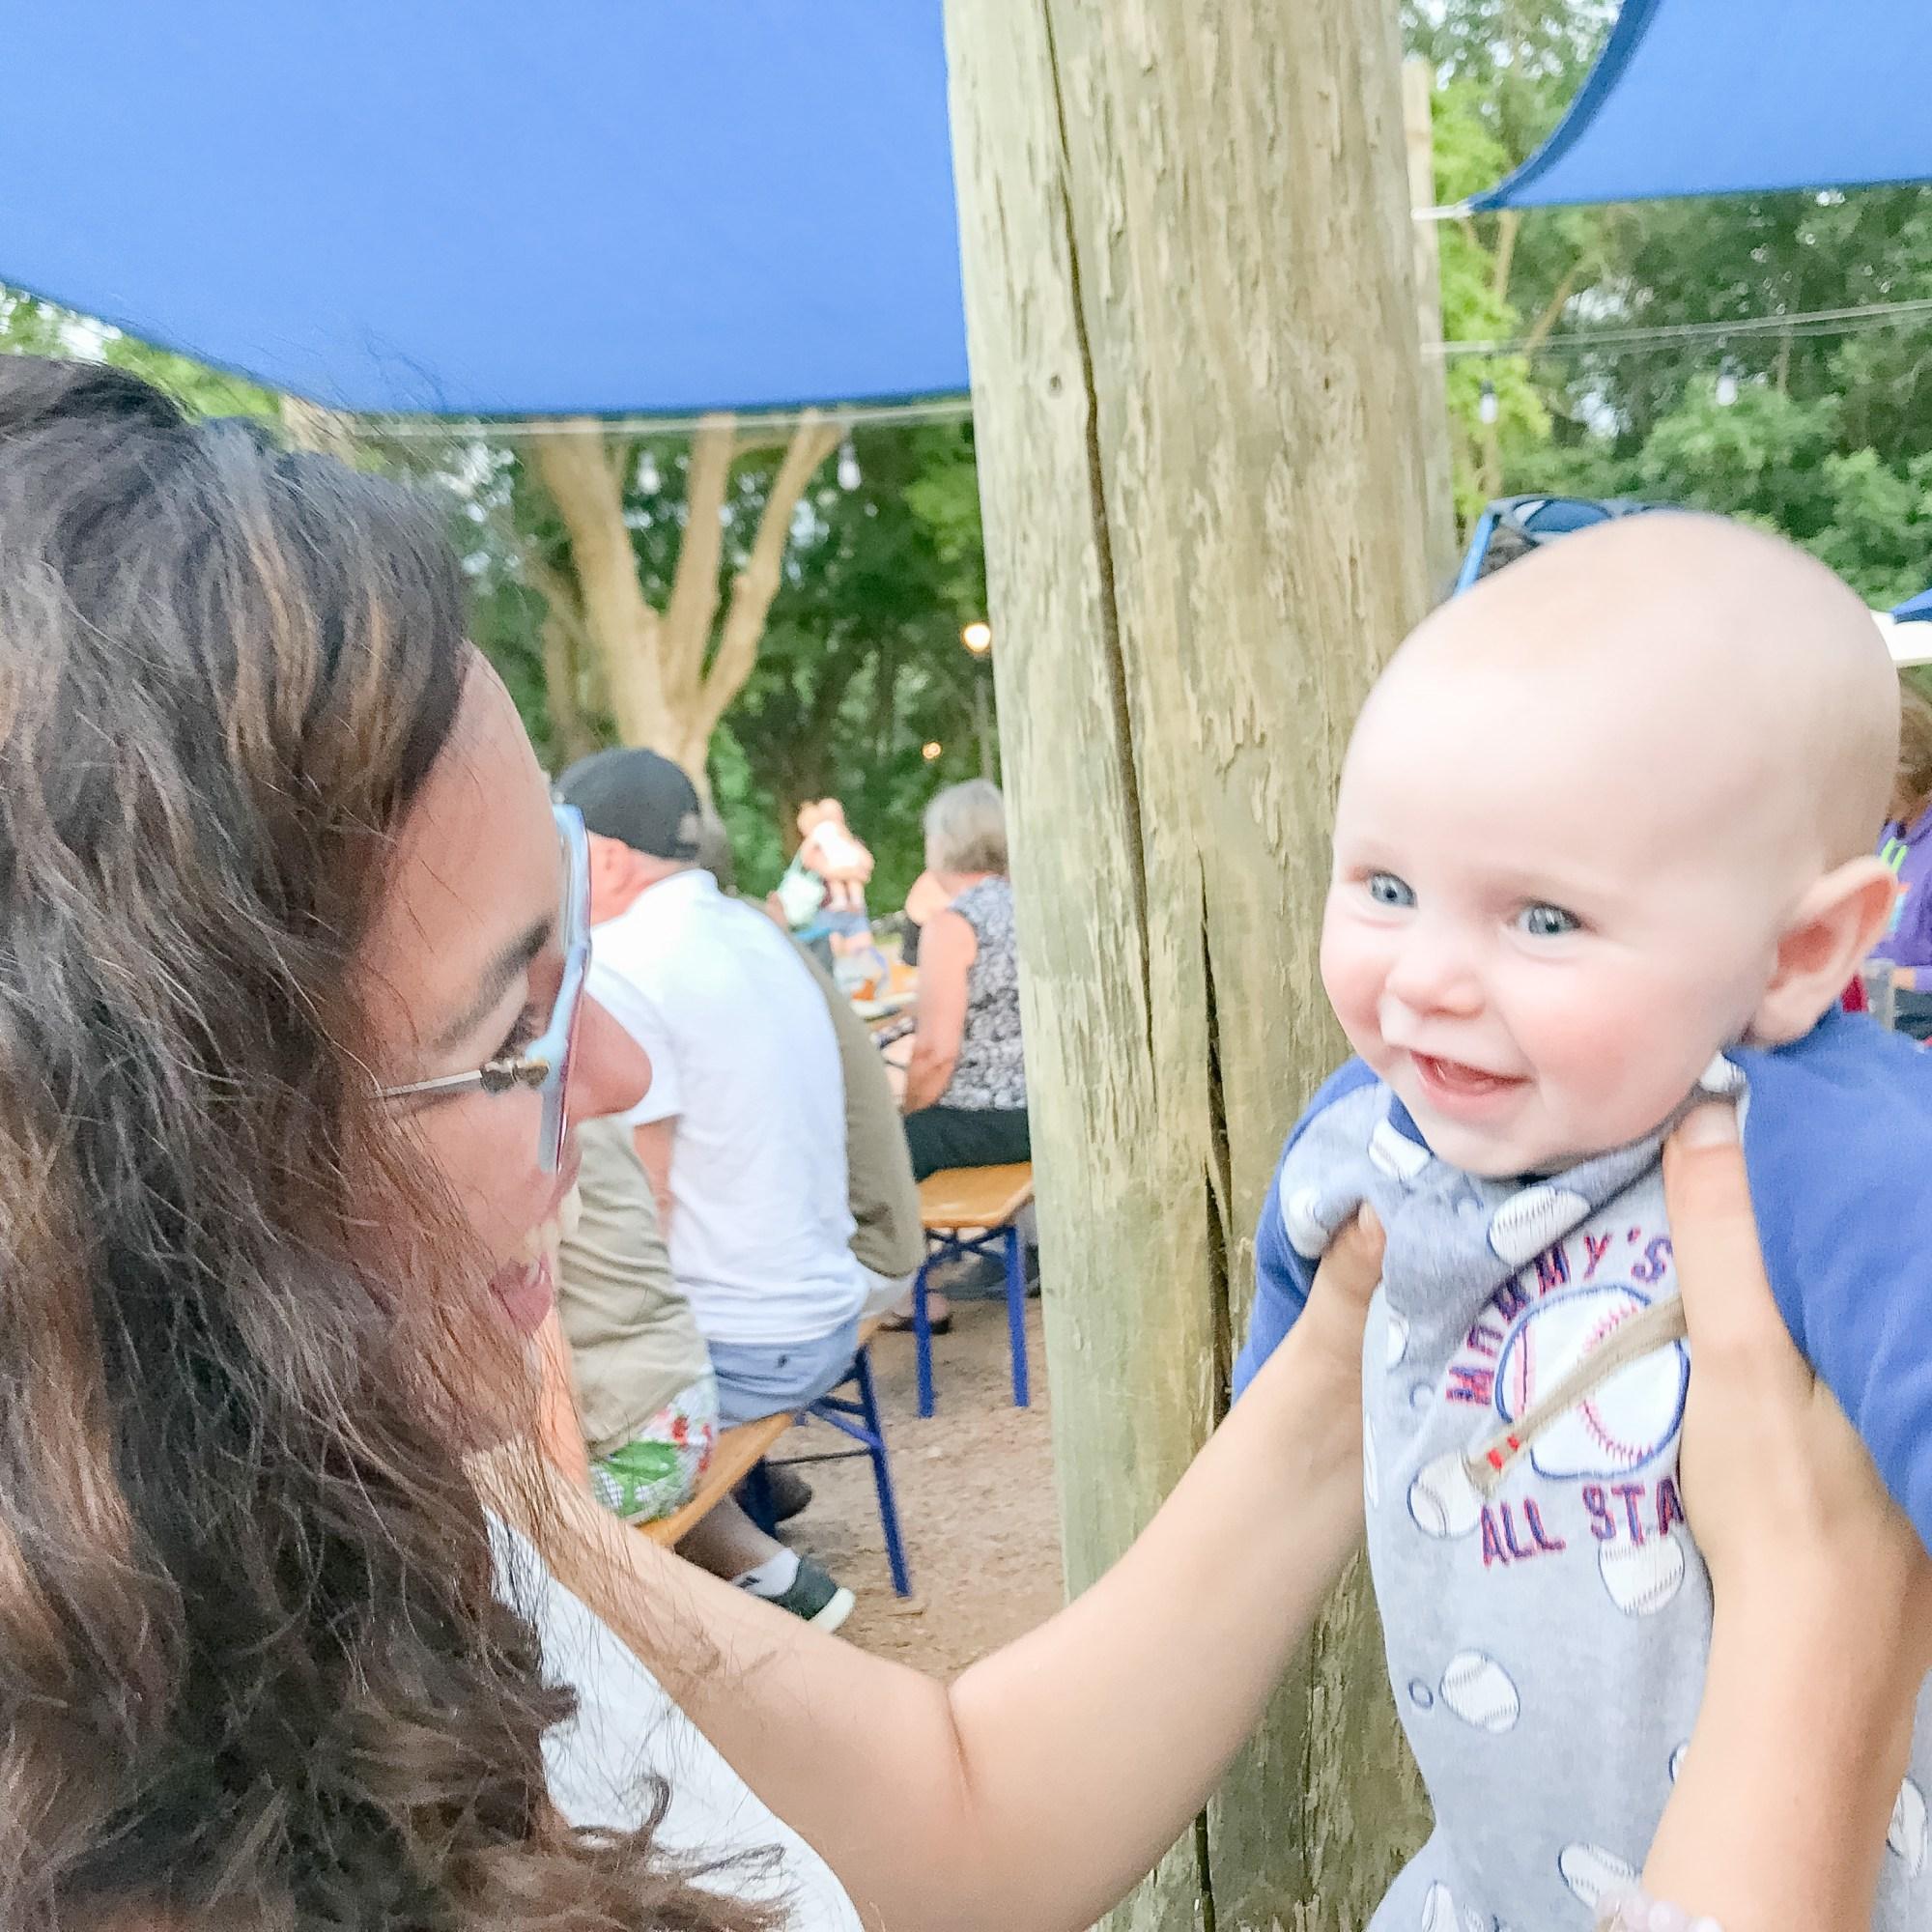 Kids' Outdoor Thrills in Milwaukee